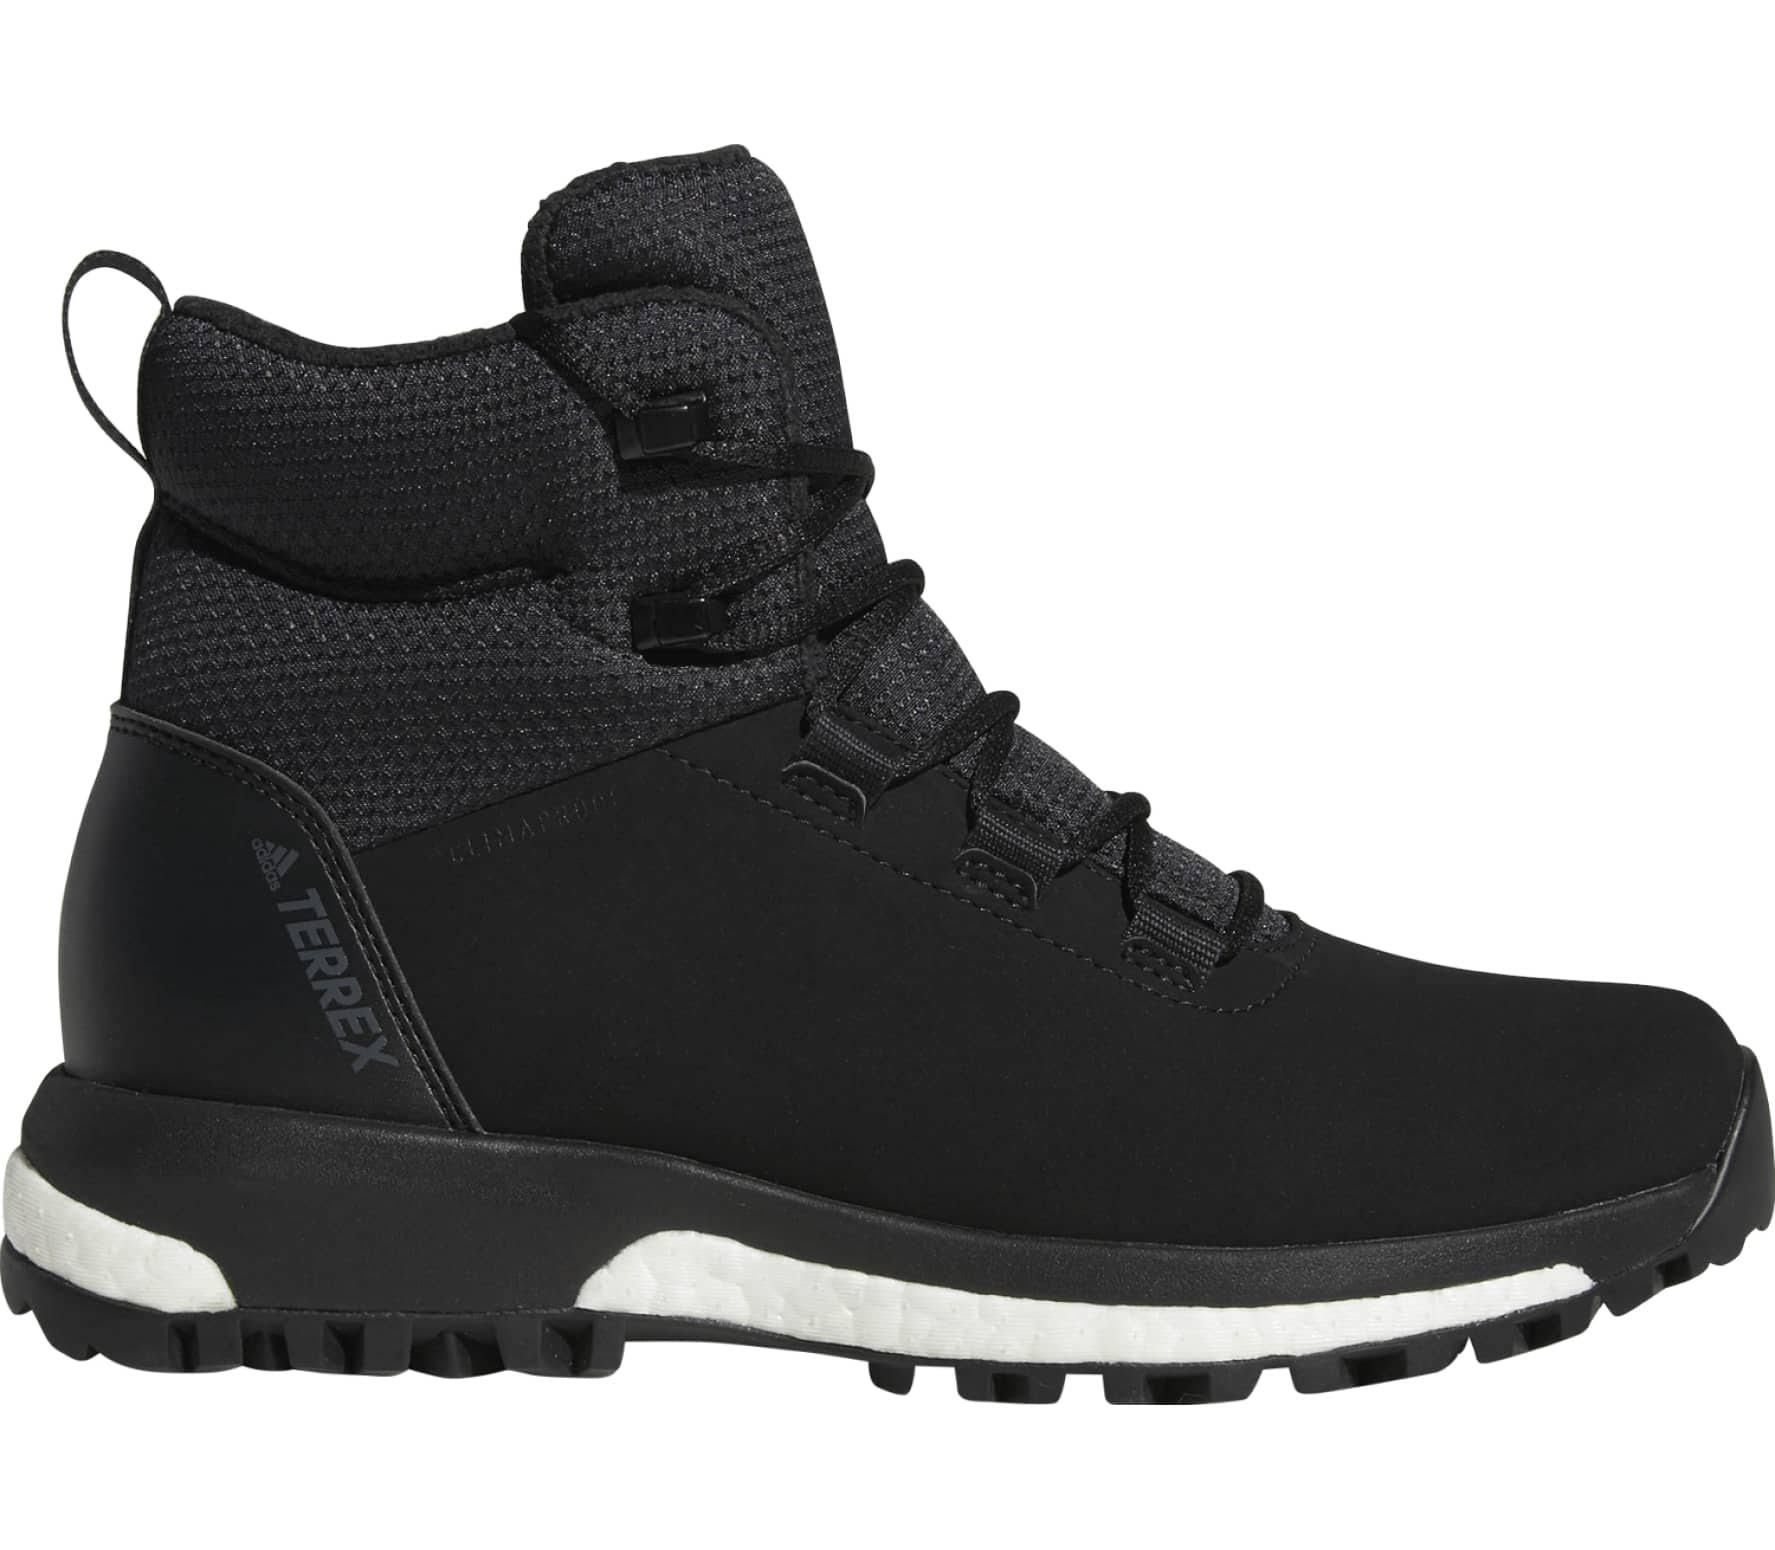 Adidas Terrex Pathmaker CW Shoes - Black - Women